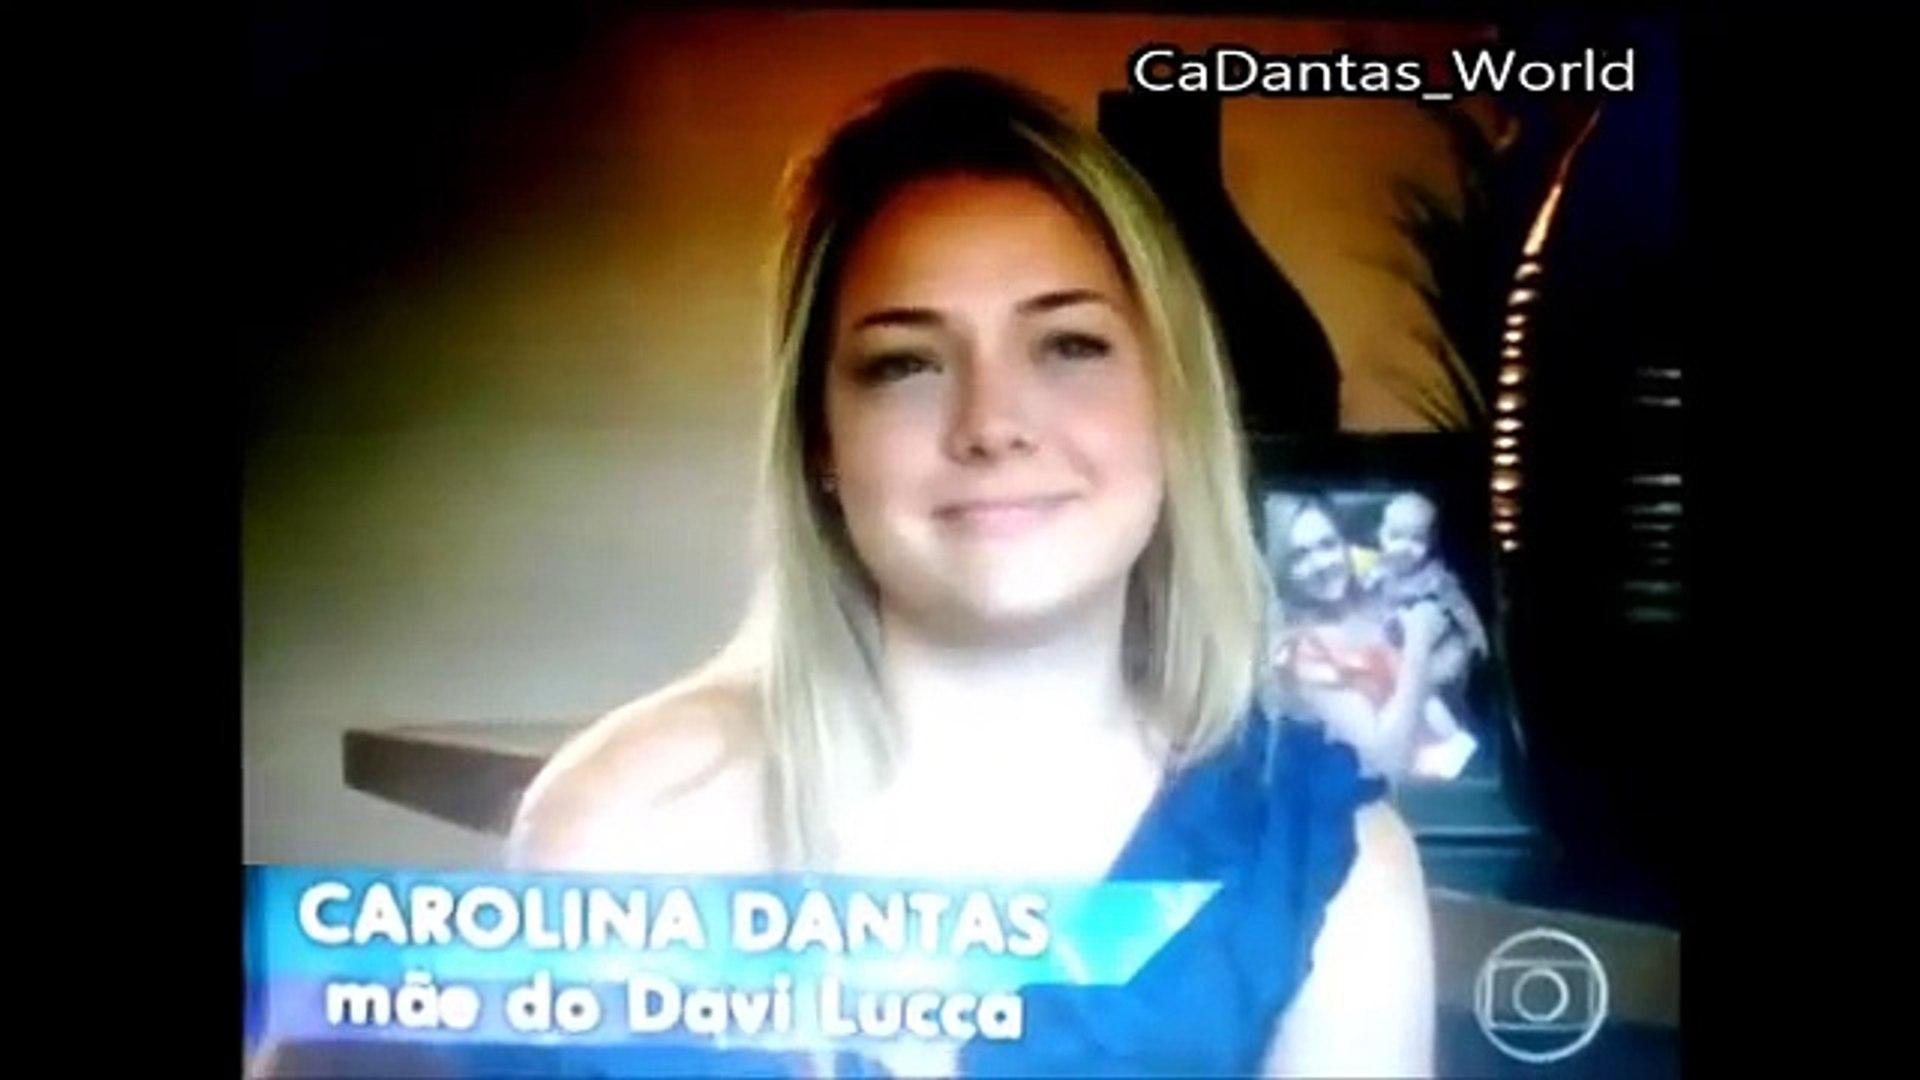 Carolina Dantas dating